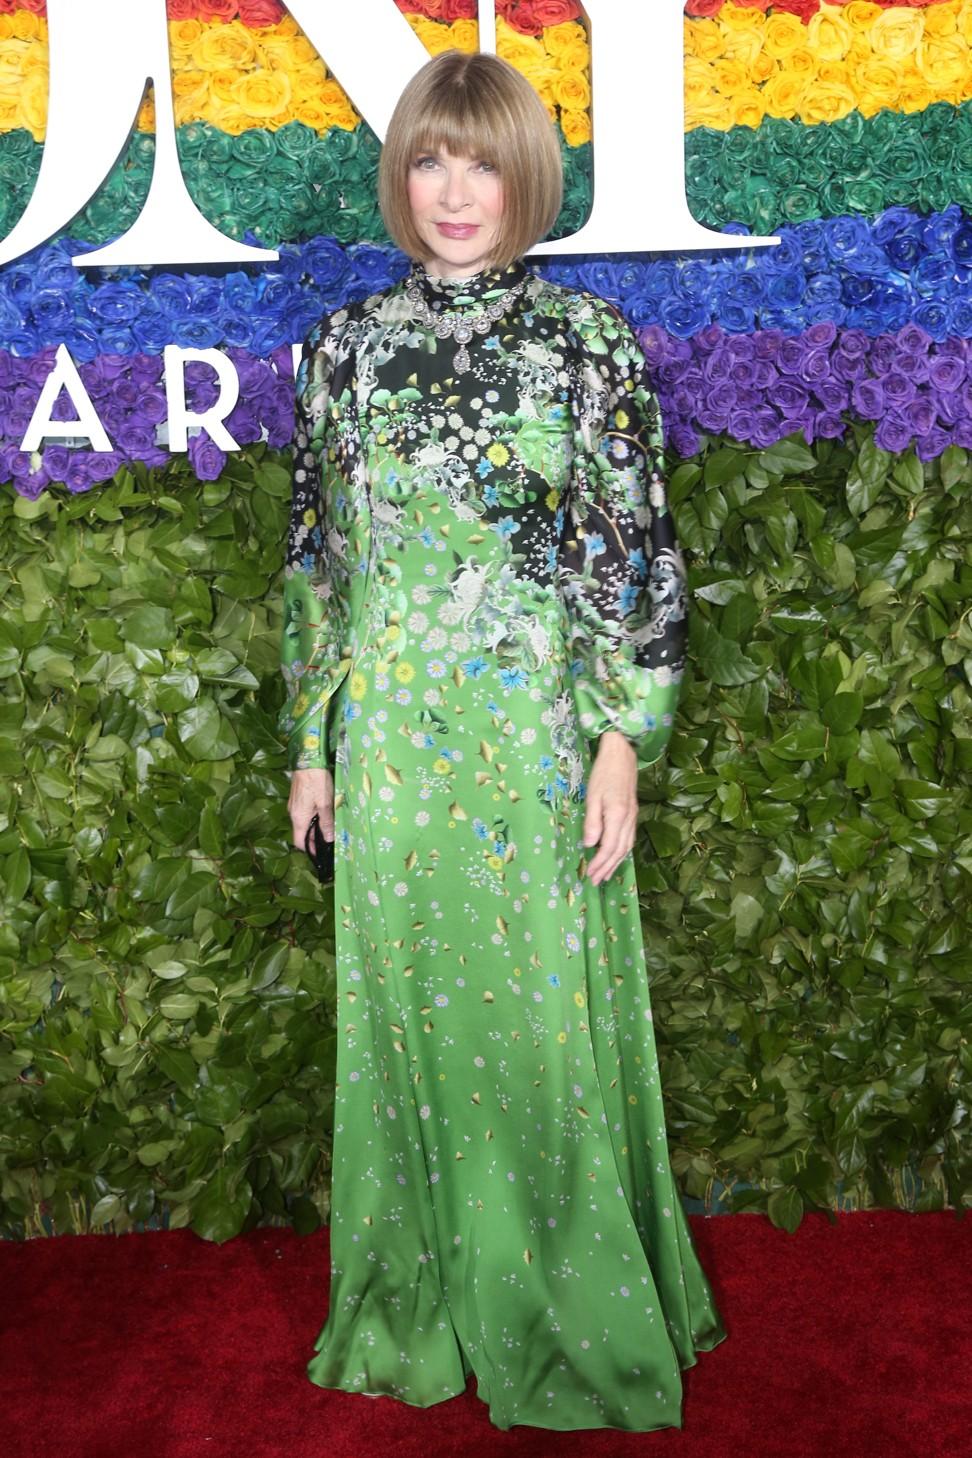 Has Anna Wintour made a fashion faux pas?